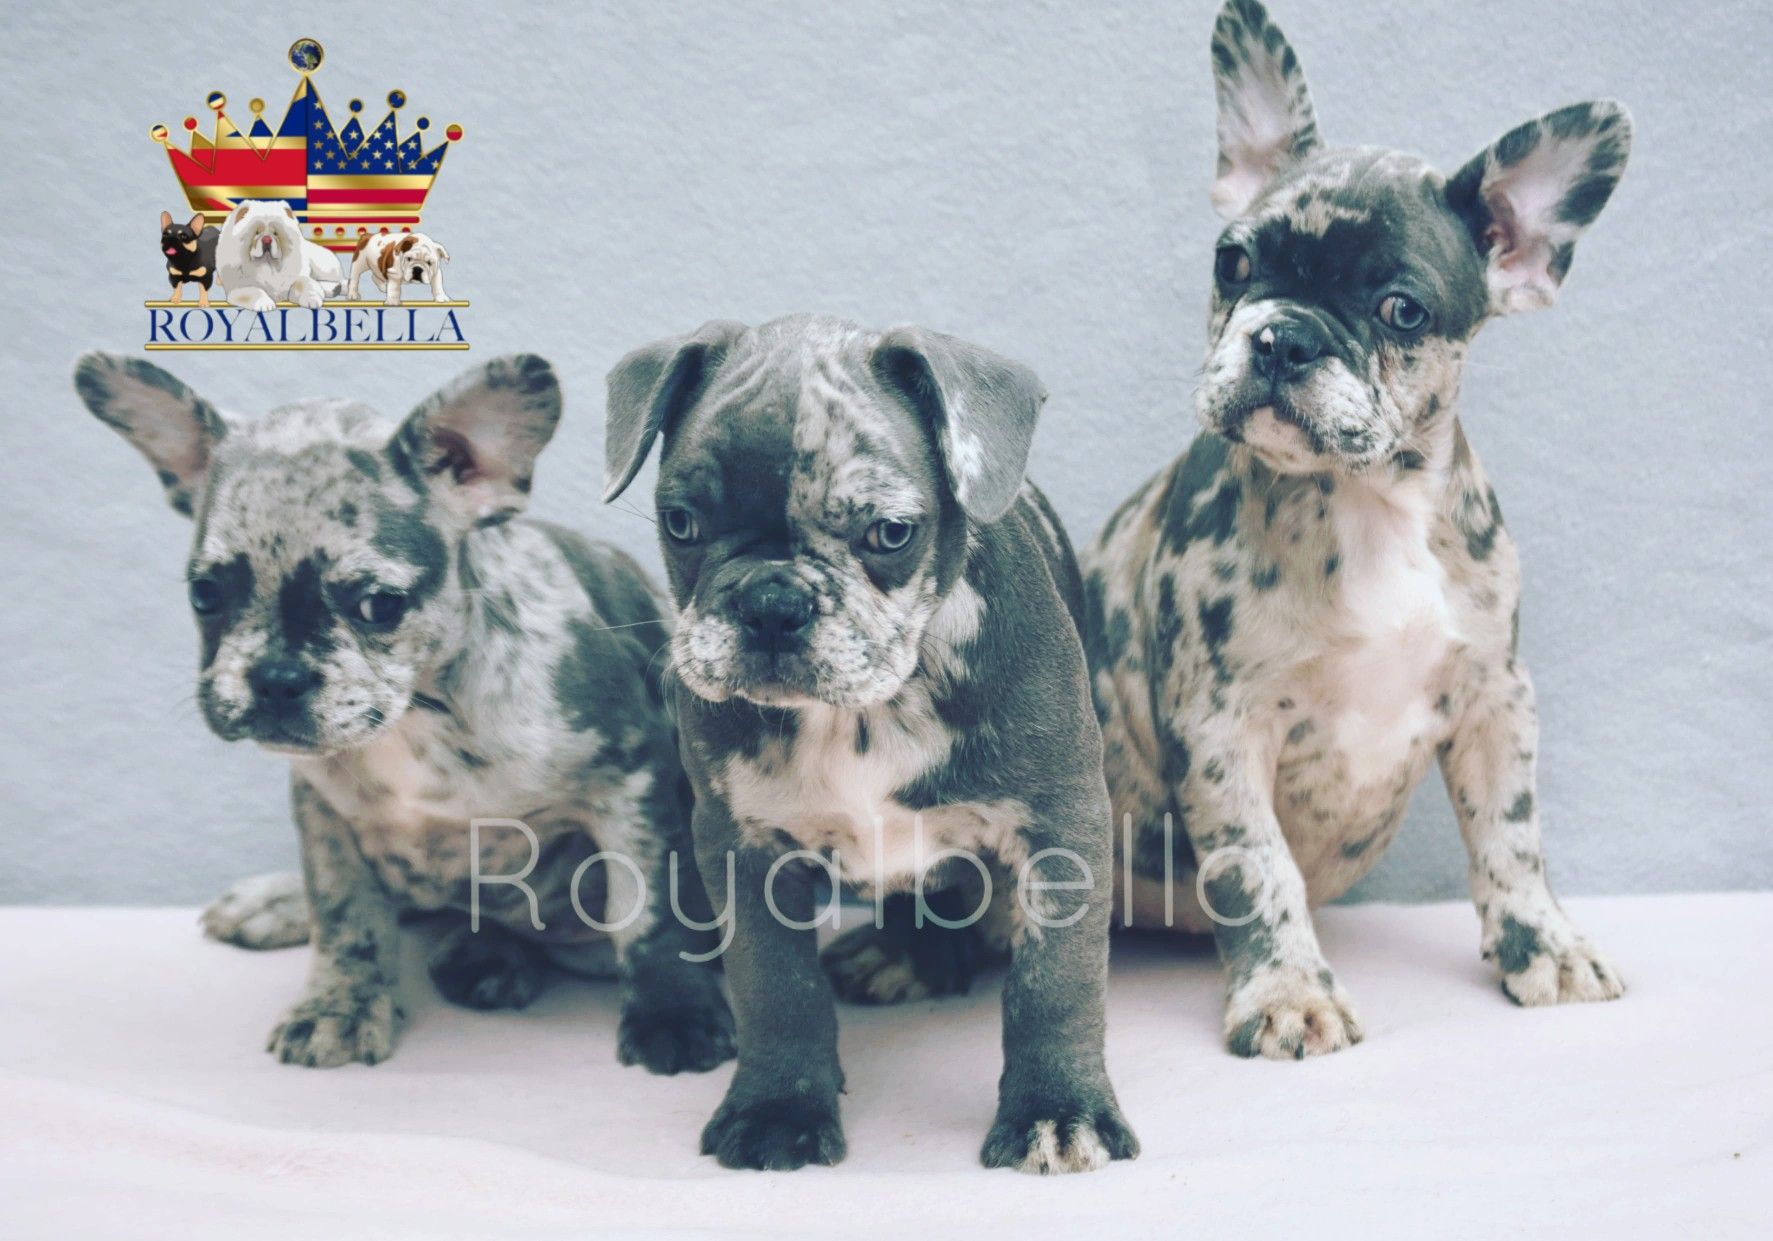 Three Beautiful Merle French Bulldog Puppies Royalbella Royalbellacouk Bulldogsbyroyalbellacom Cute Healthy Luxury Dog